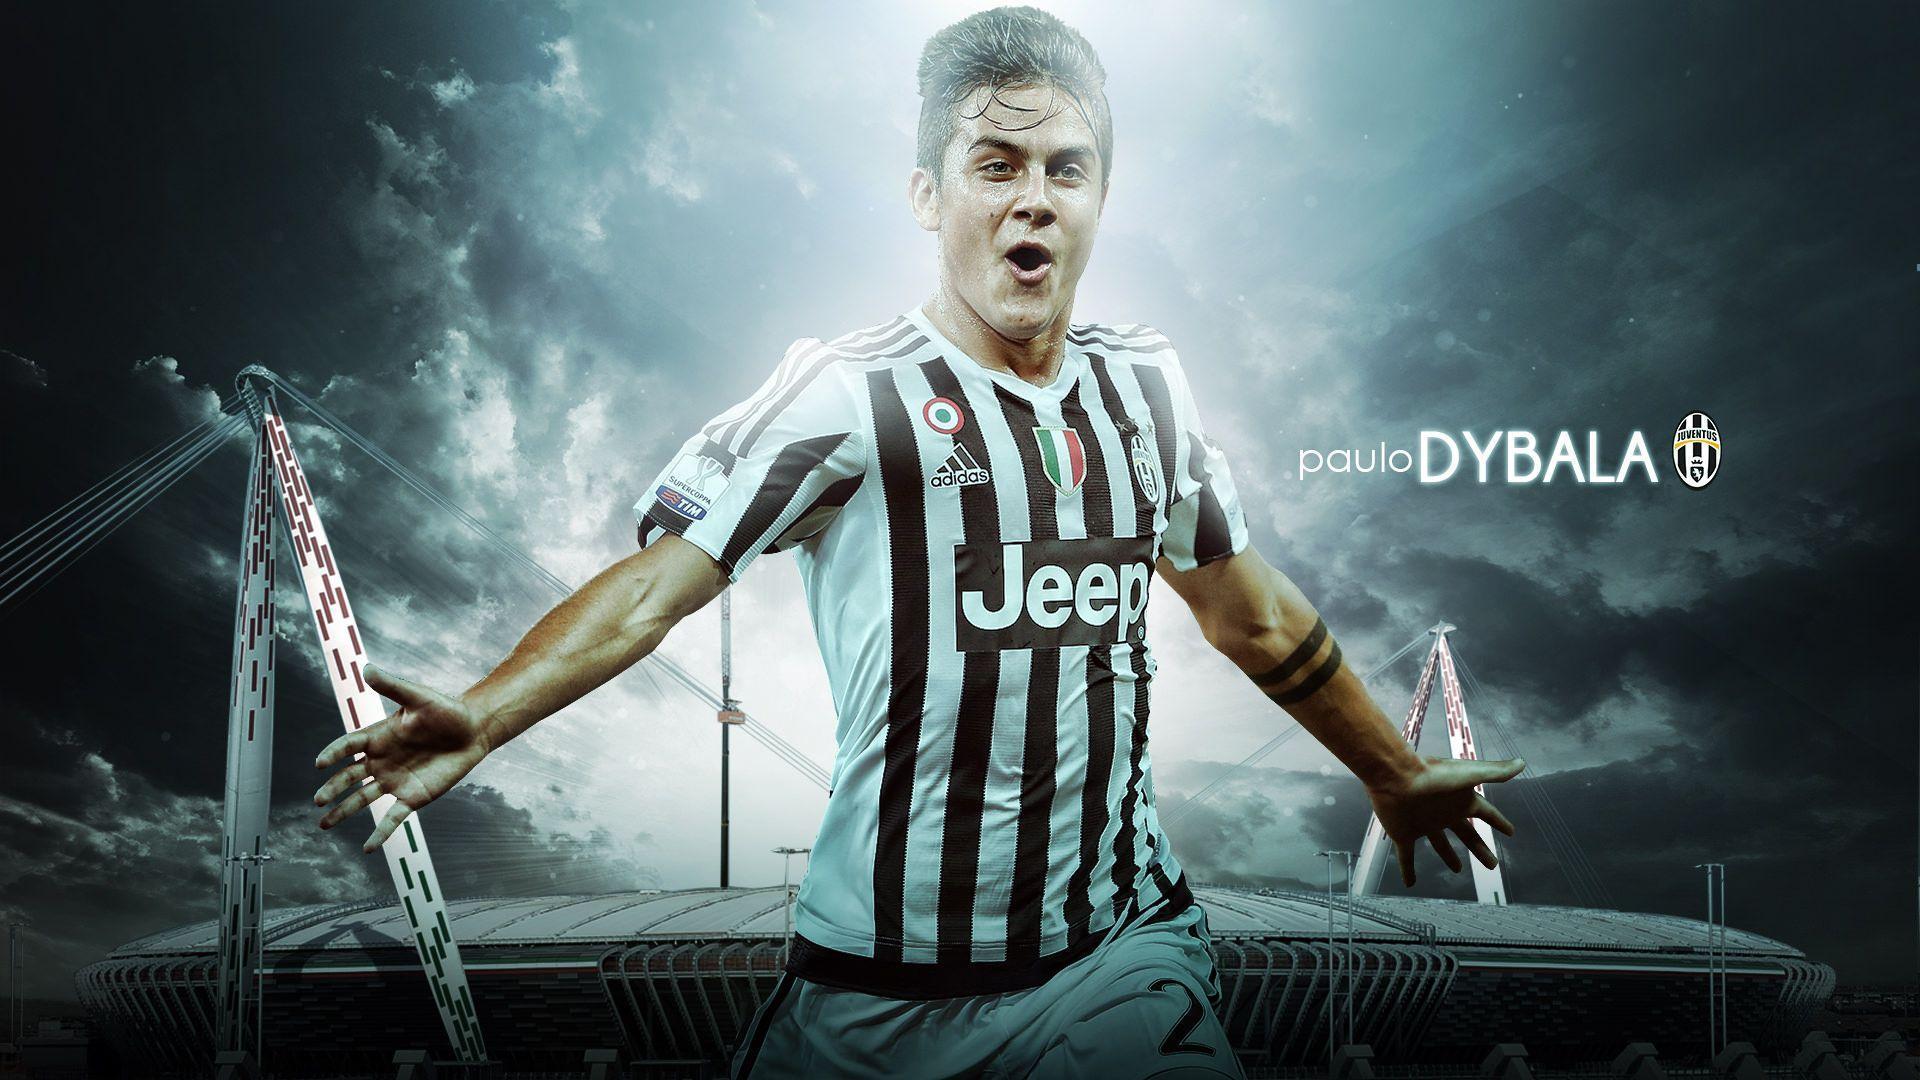 Paulo Dybala HD Image - New HD Images